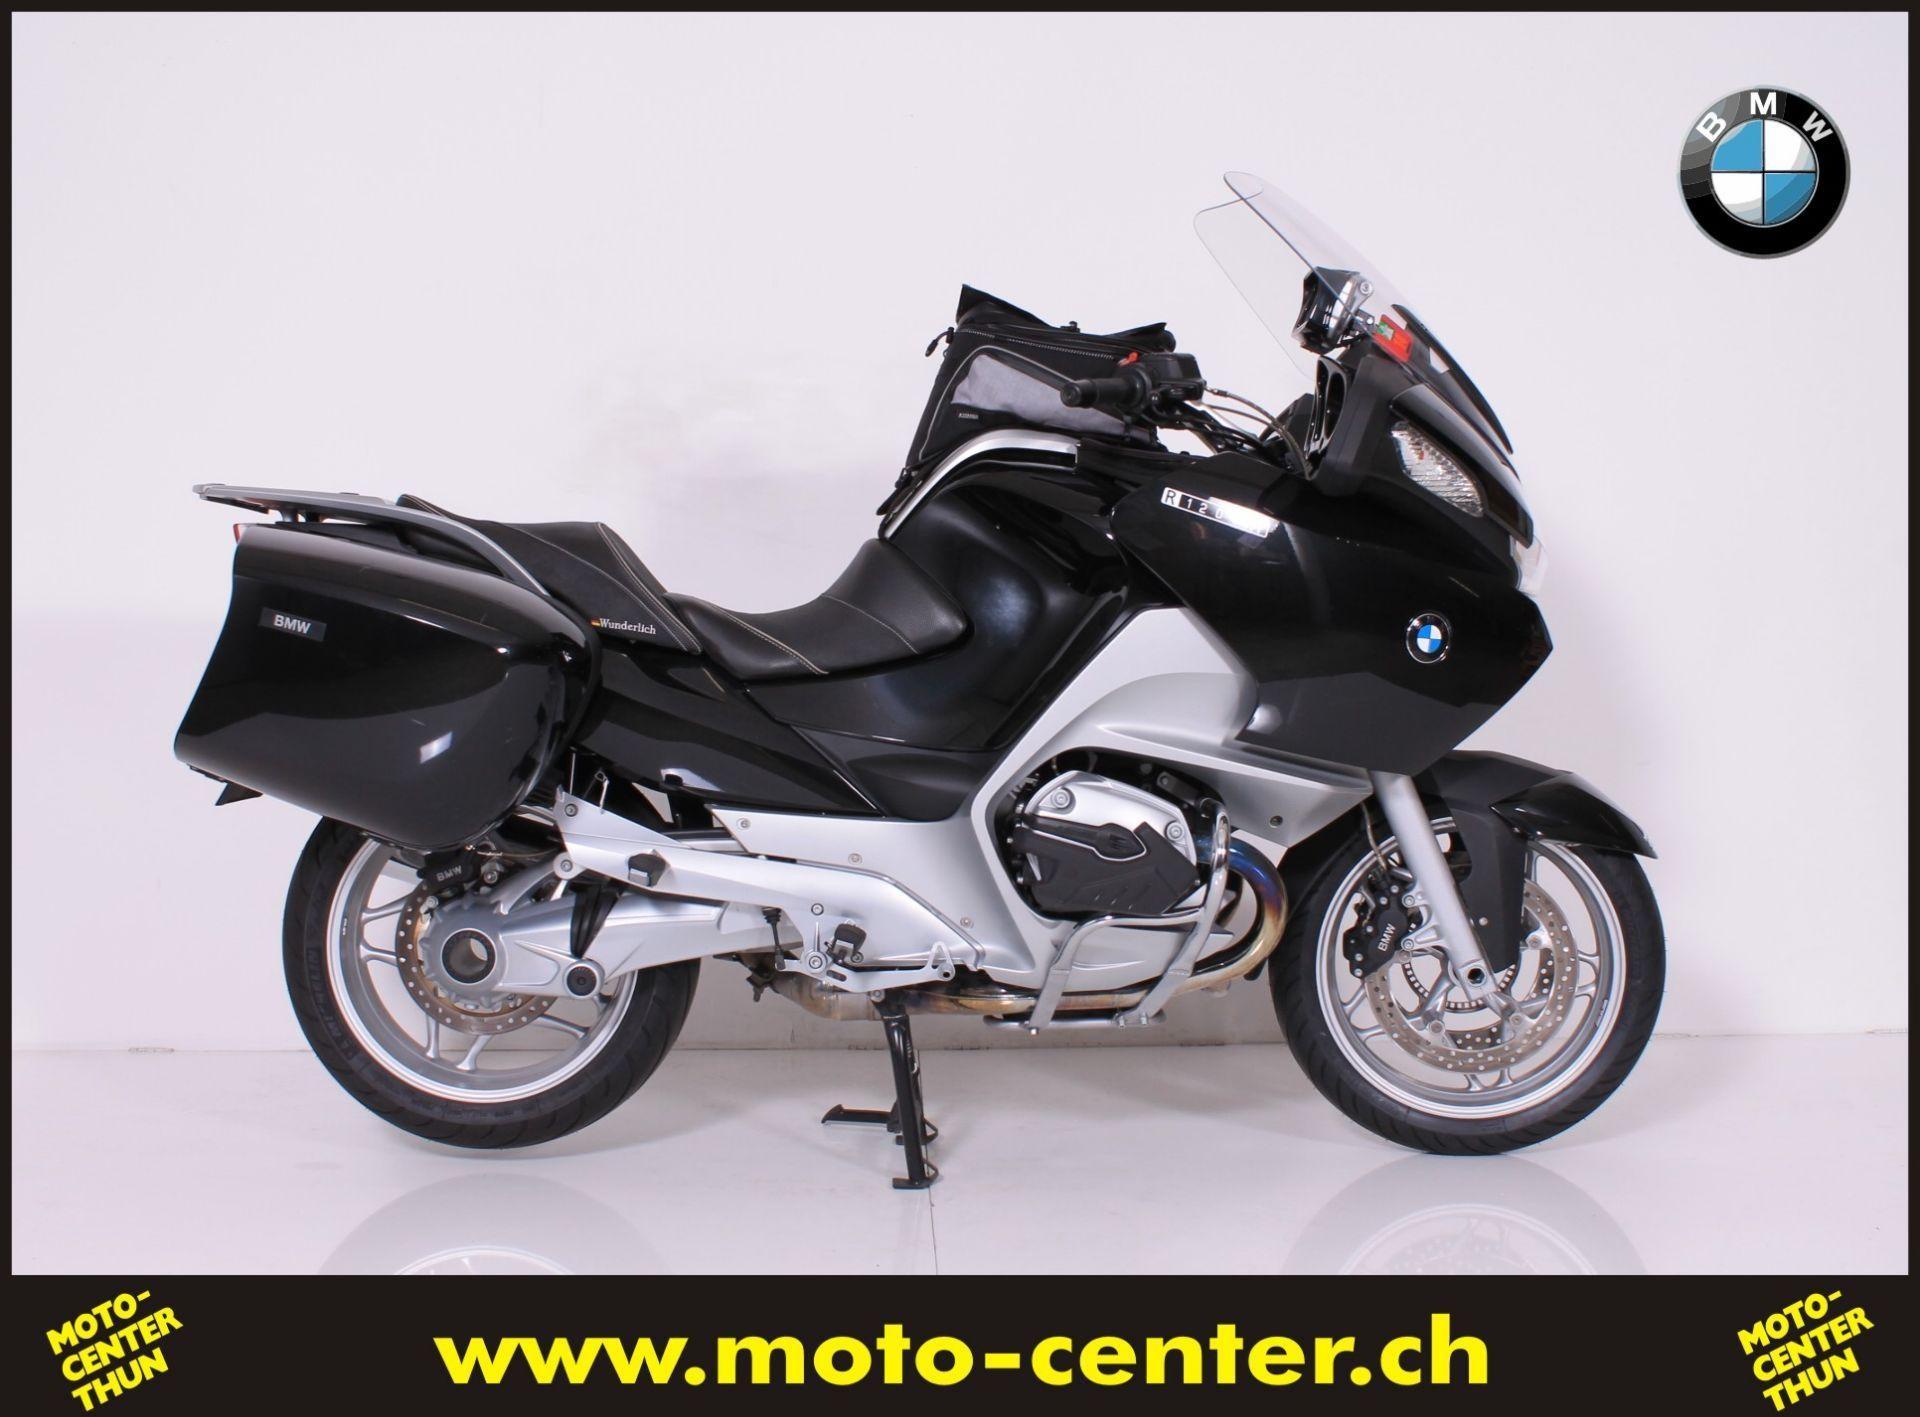 bmw r 1200 rt abs moto center thun steffisburg occasion. Black Bedroom Furniture Sets. Home Design Ideas